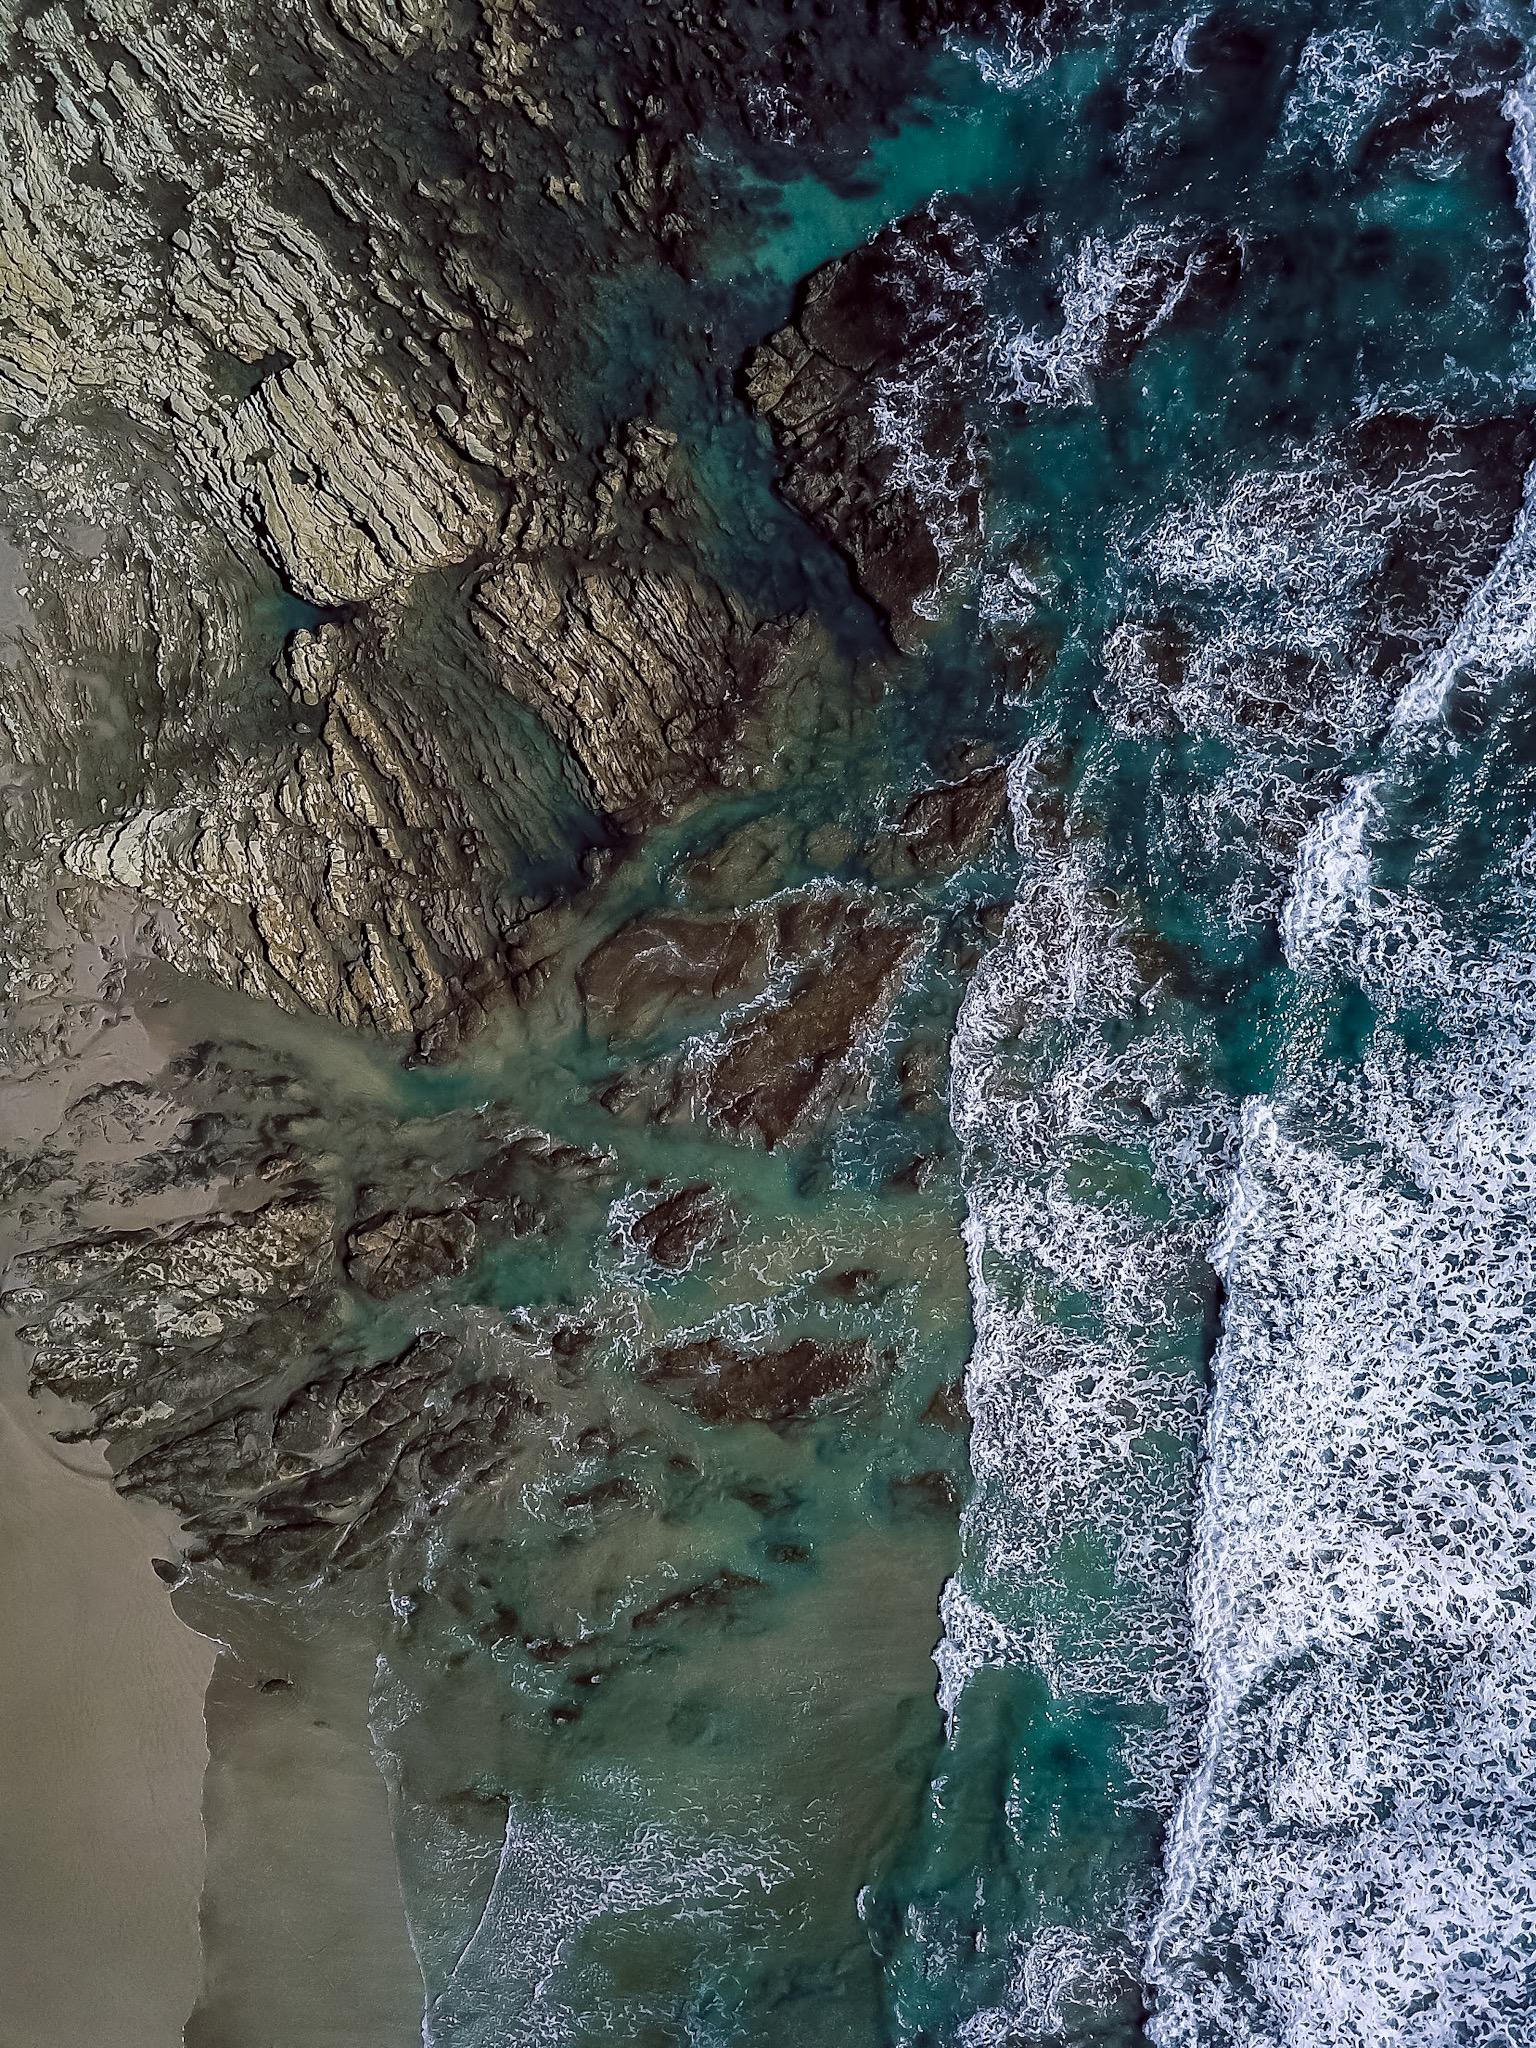 SantaTeresa-Beach-YogaRetreat-Drone-Photography-Costa-Rica